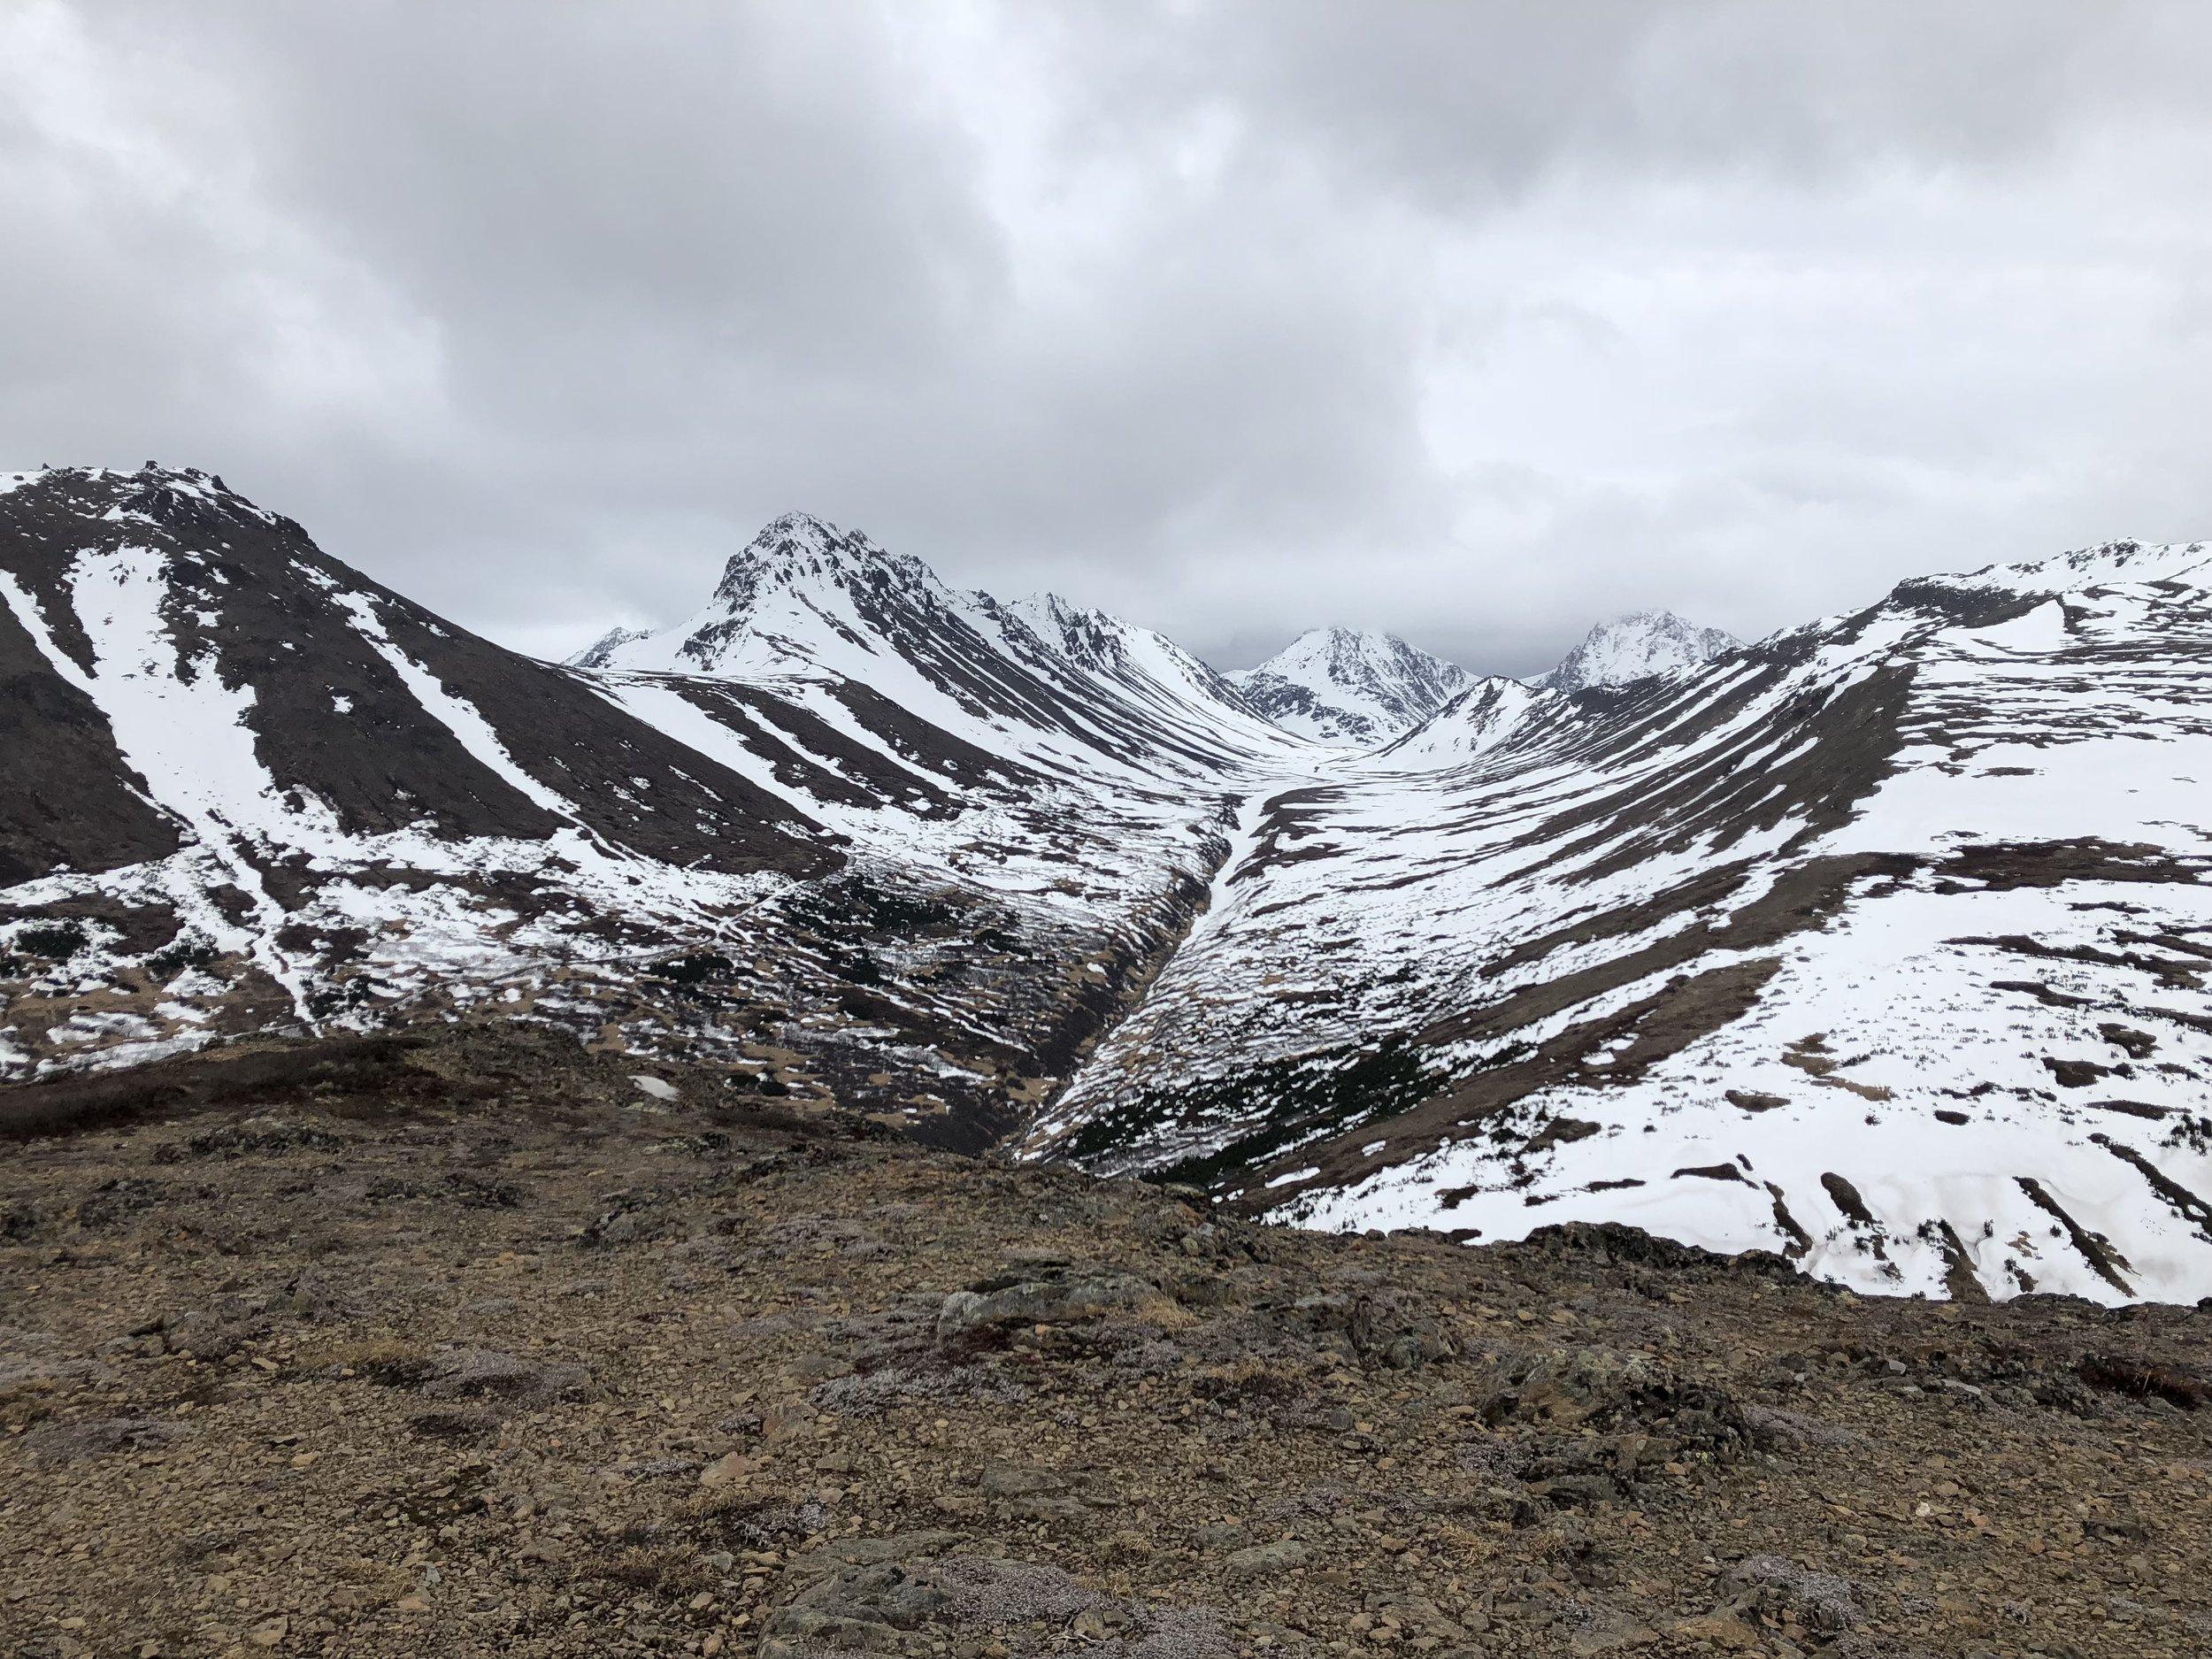 2018-05-19 McHugh Peak 017.JPG